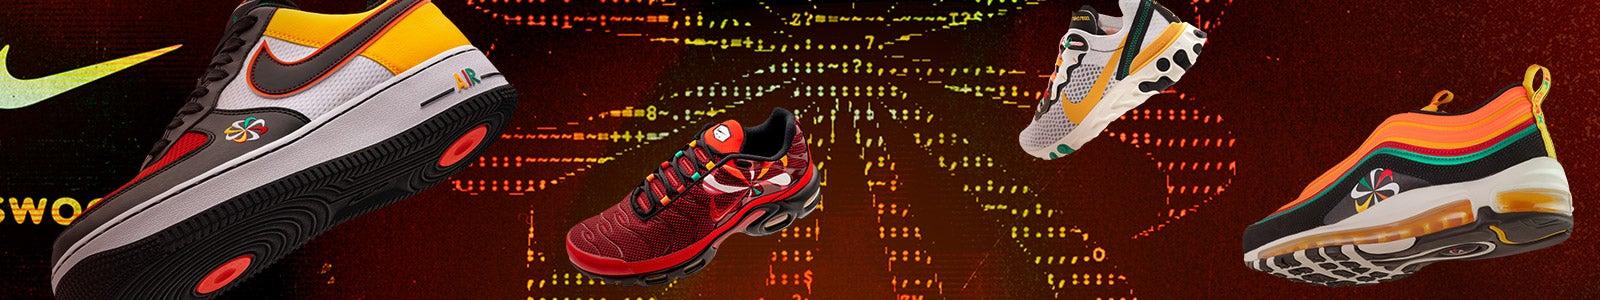 Retro Raptors Colors On This Nike Air Max 97 Ultra